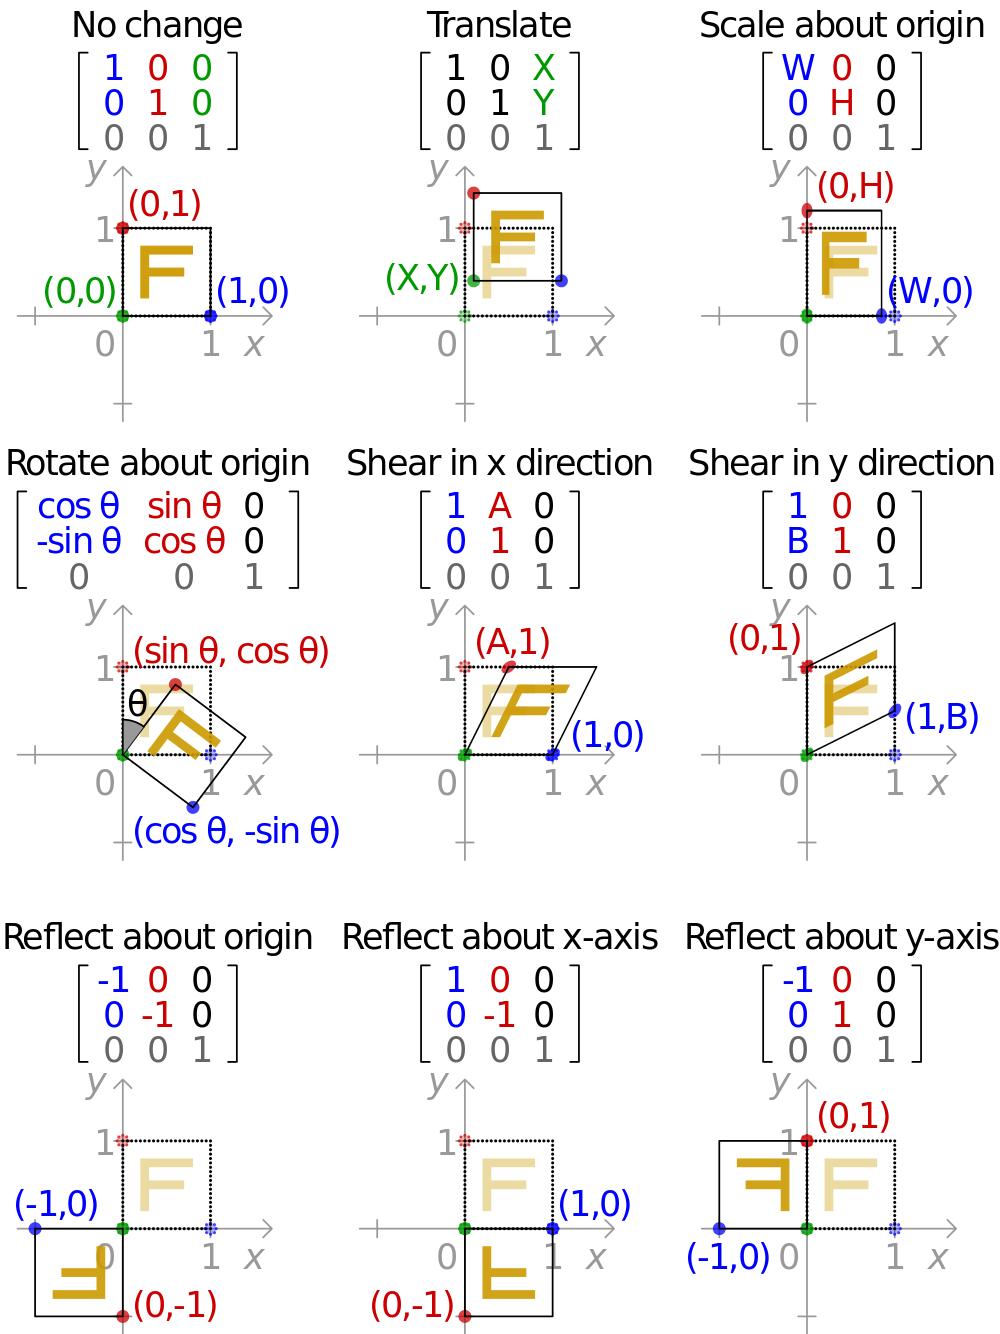 2D affine transformation matrix.